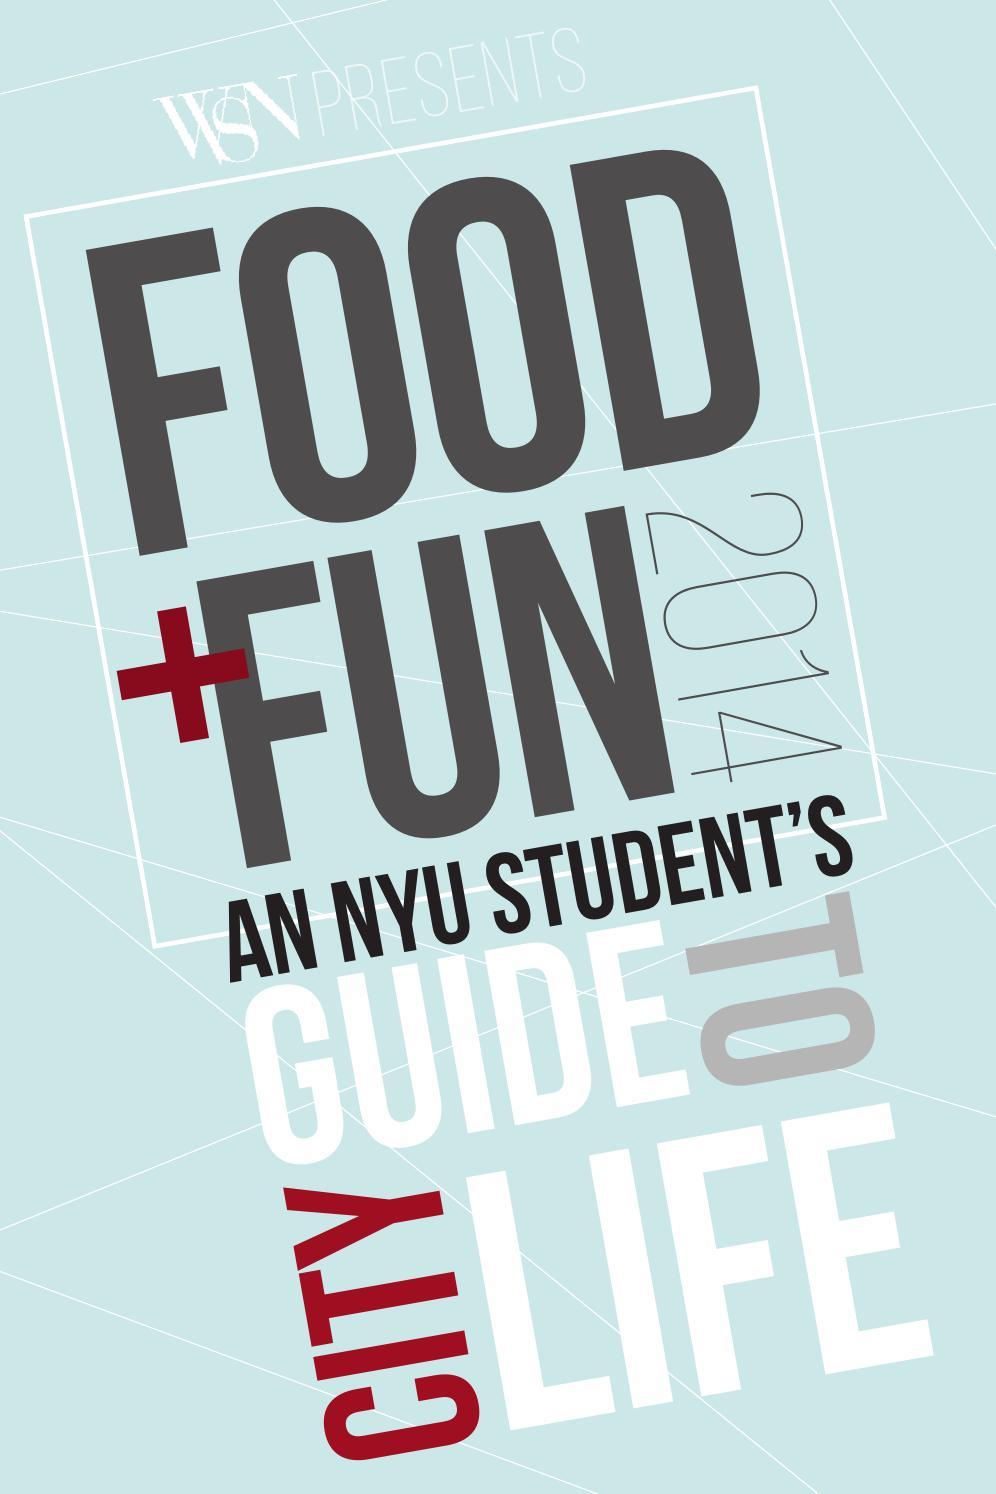 Food Amp Fun Guide 2014 By Washington Square News Issuu